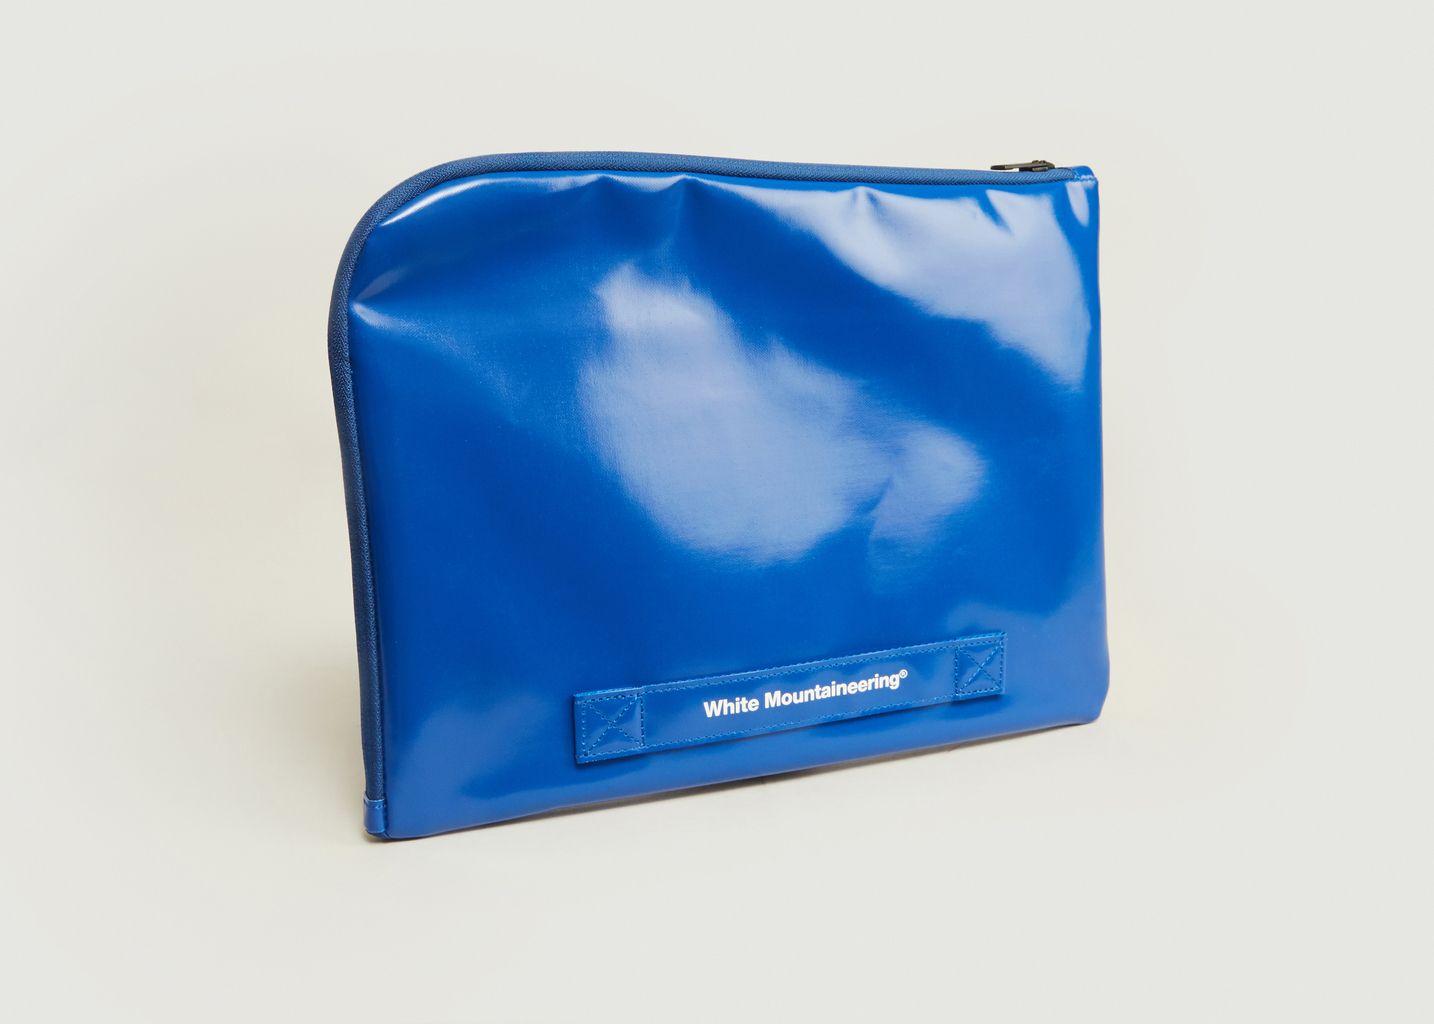 WM x Porter Clutch Bag - White Mountaineering